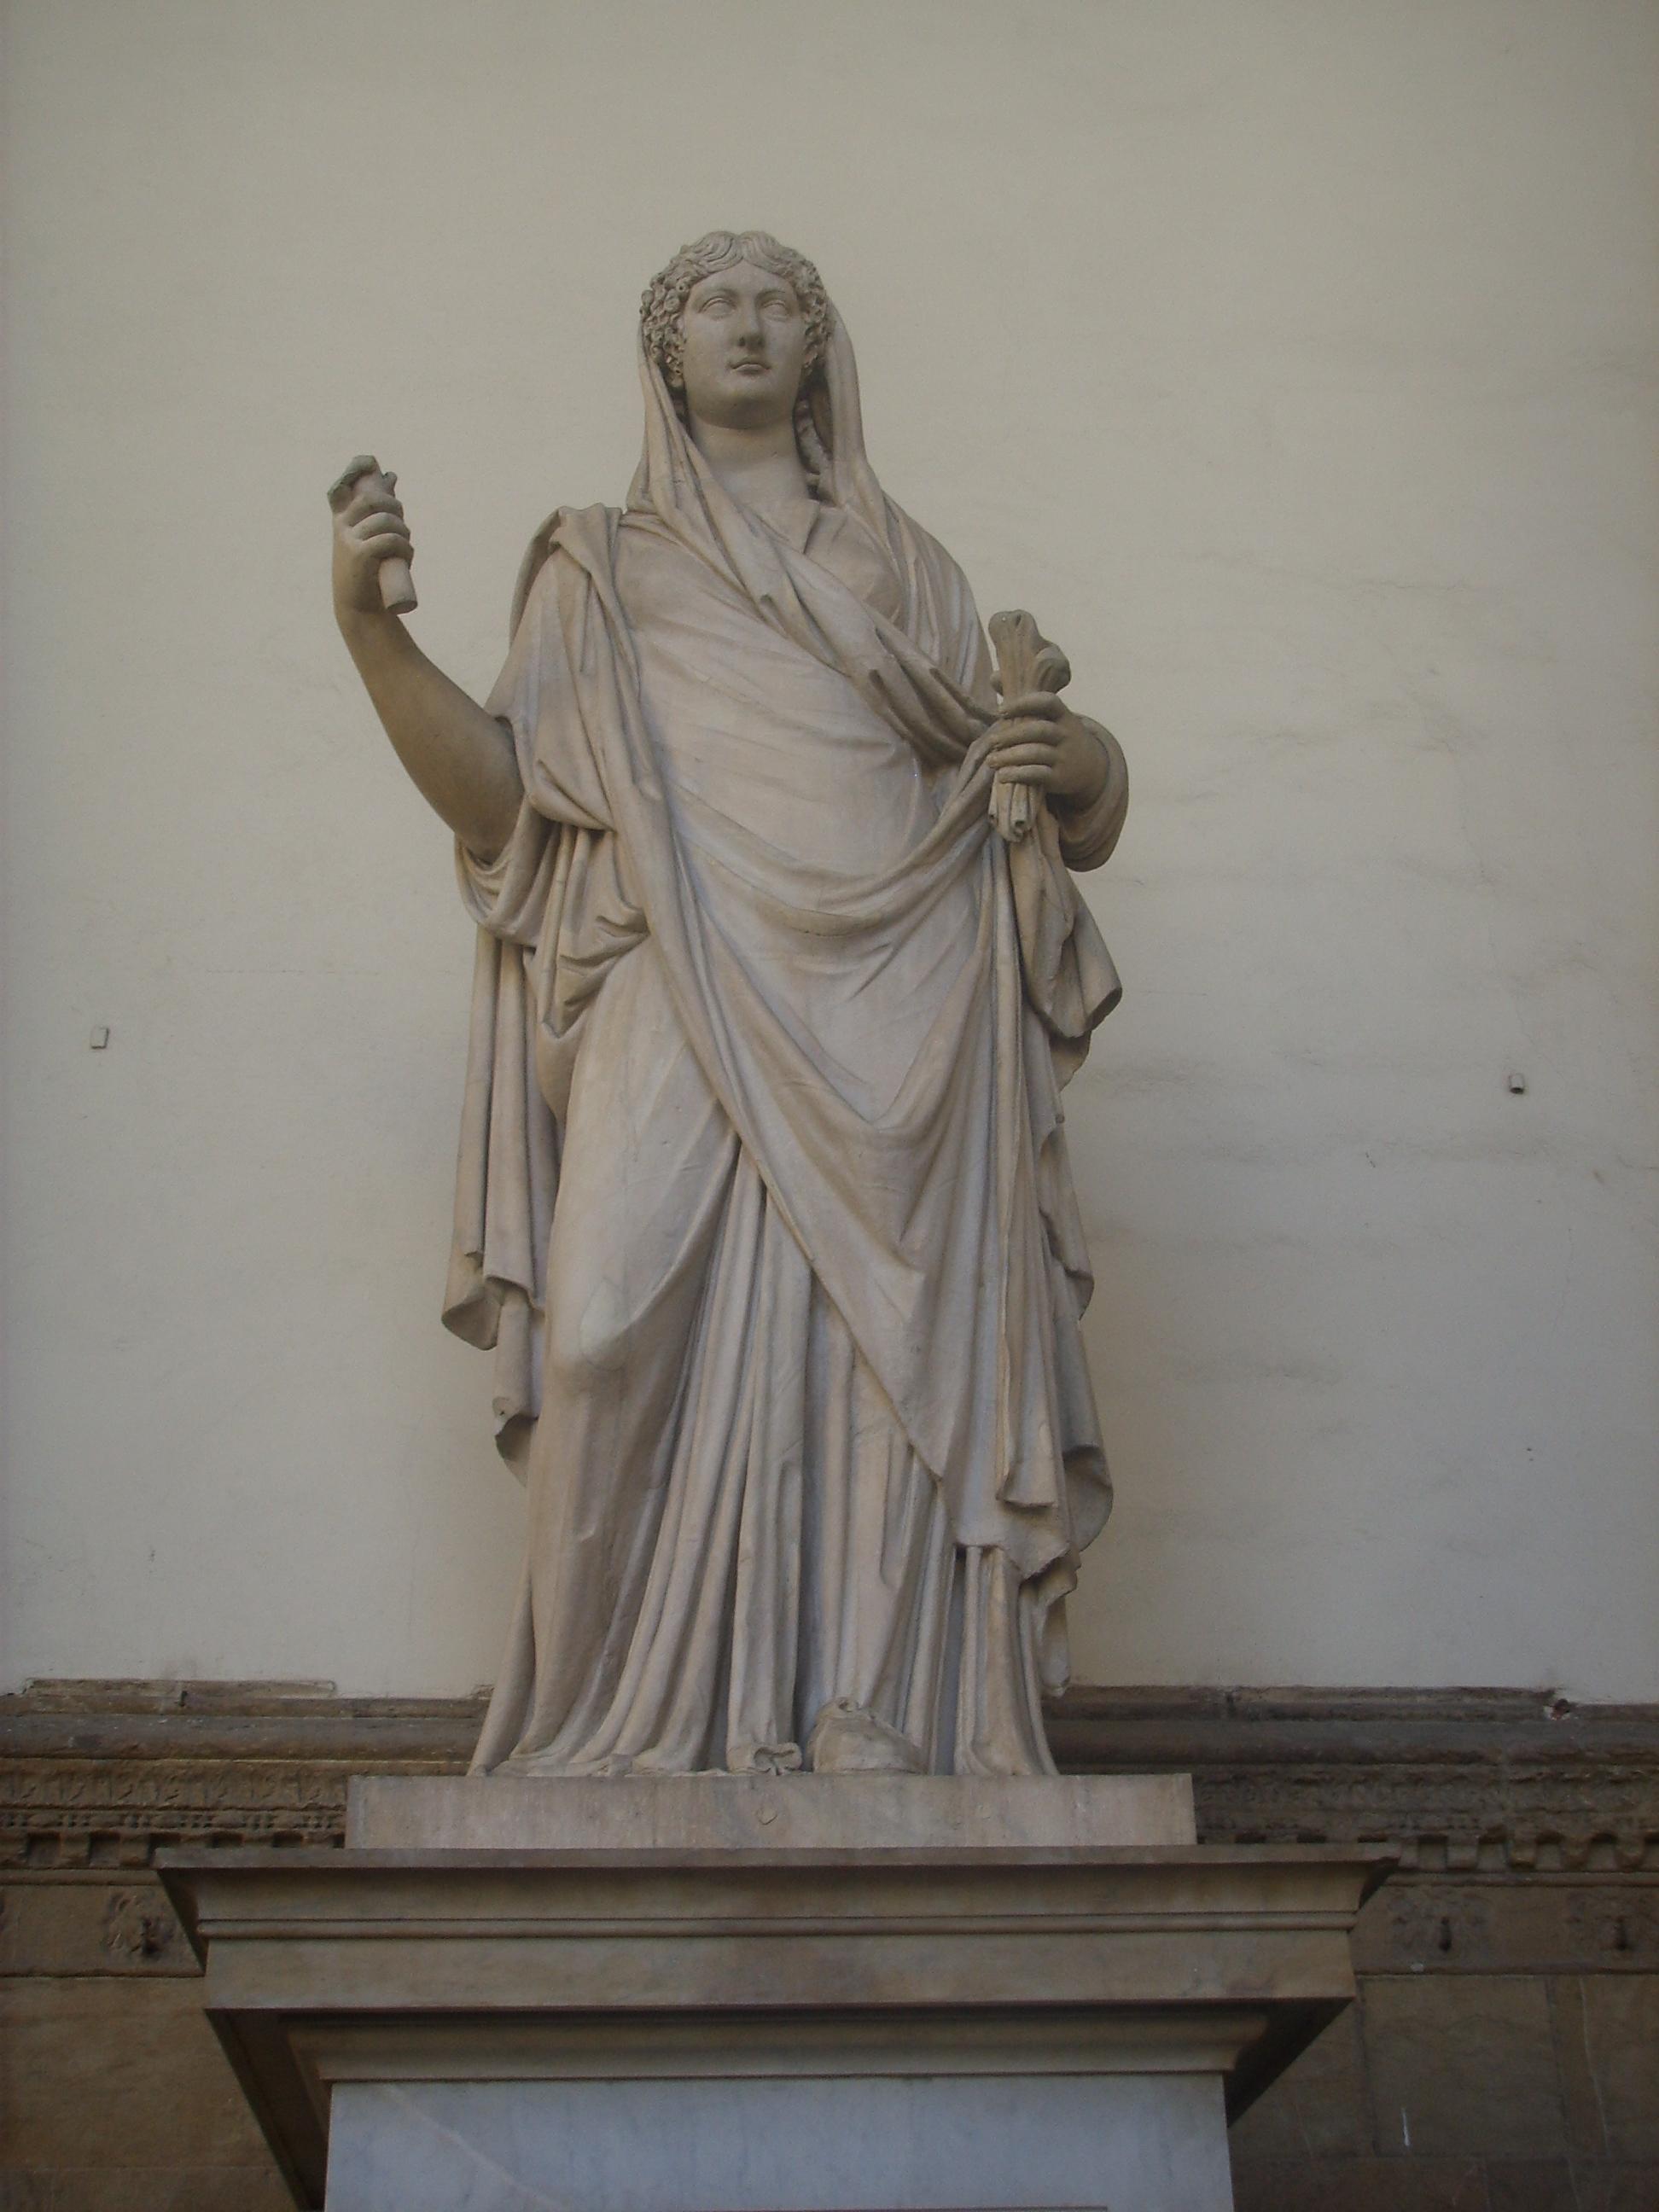 Firenze, Loggia dei Lanzi, Julia Agrippina Minor